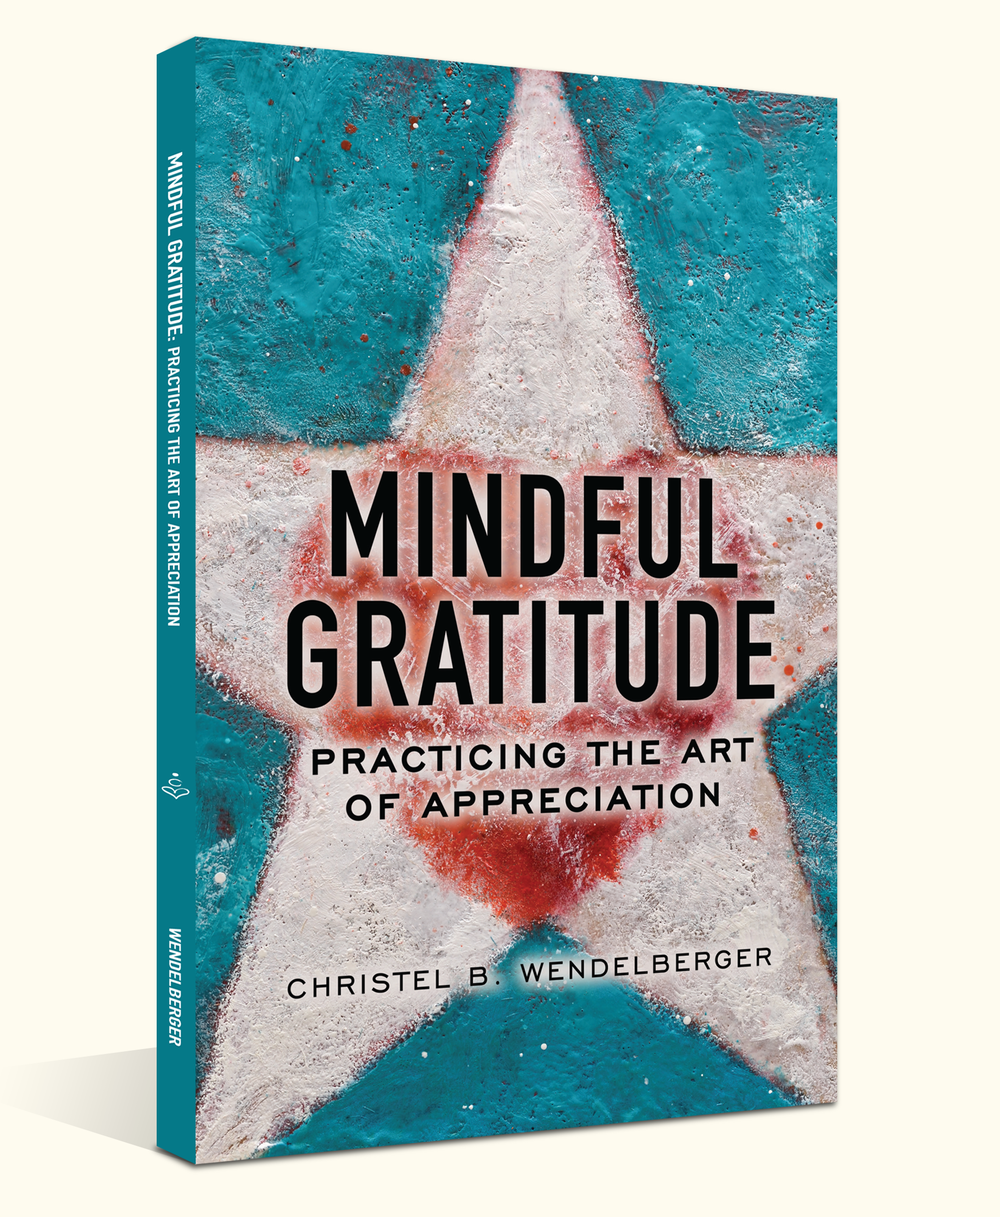 MindfulGratitude_Book_Mockup_WEB.png